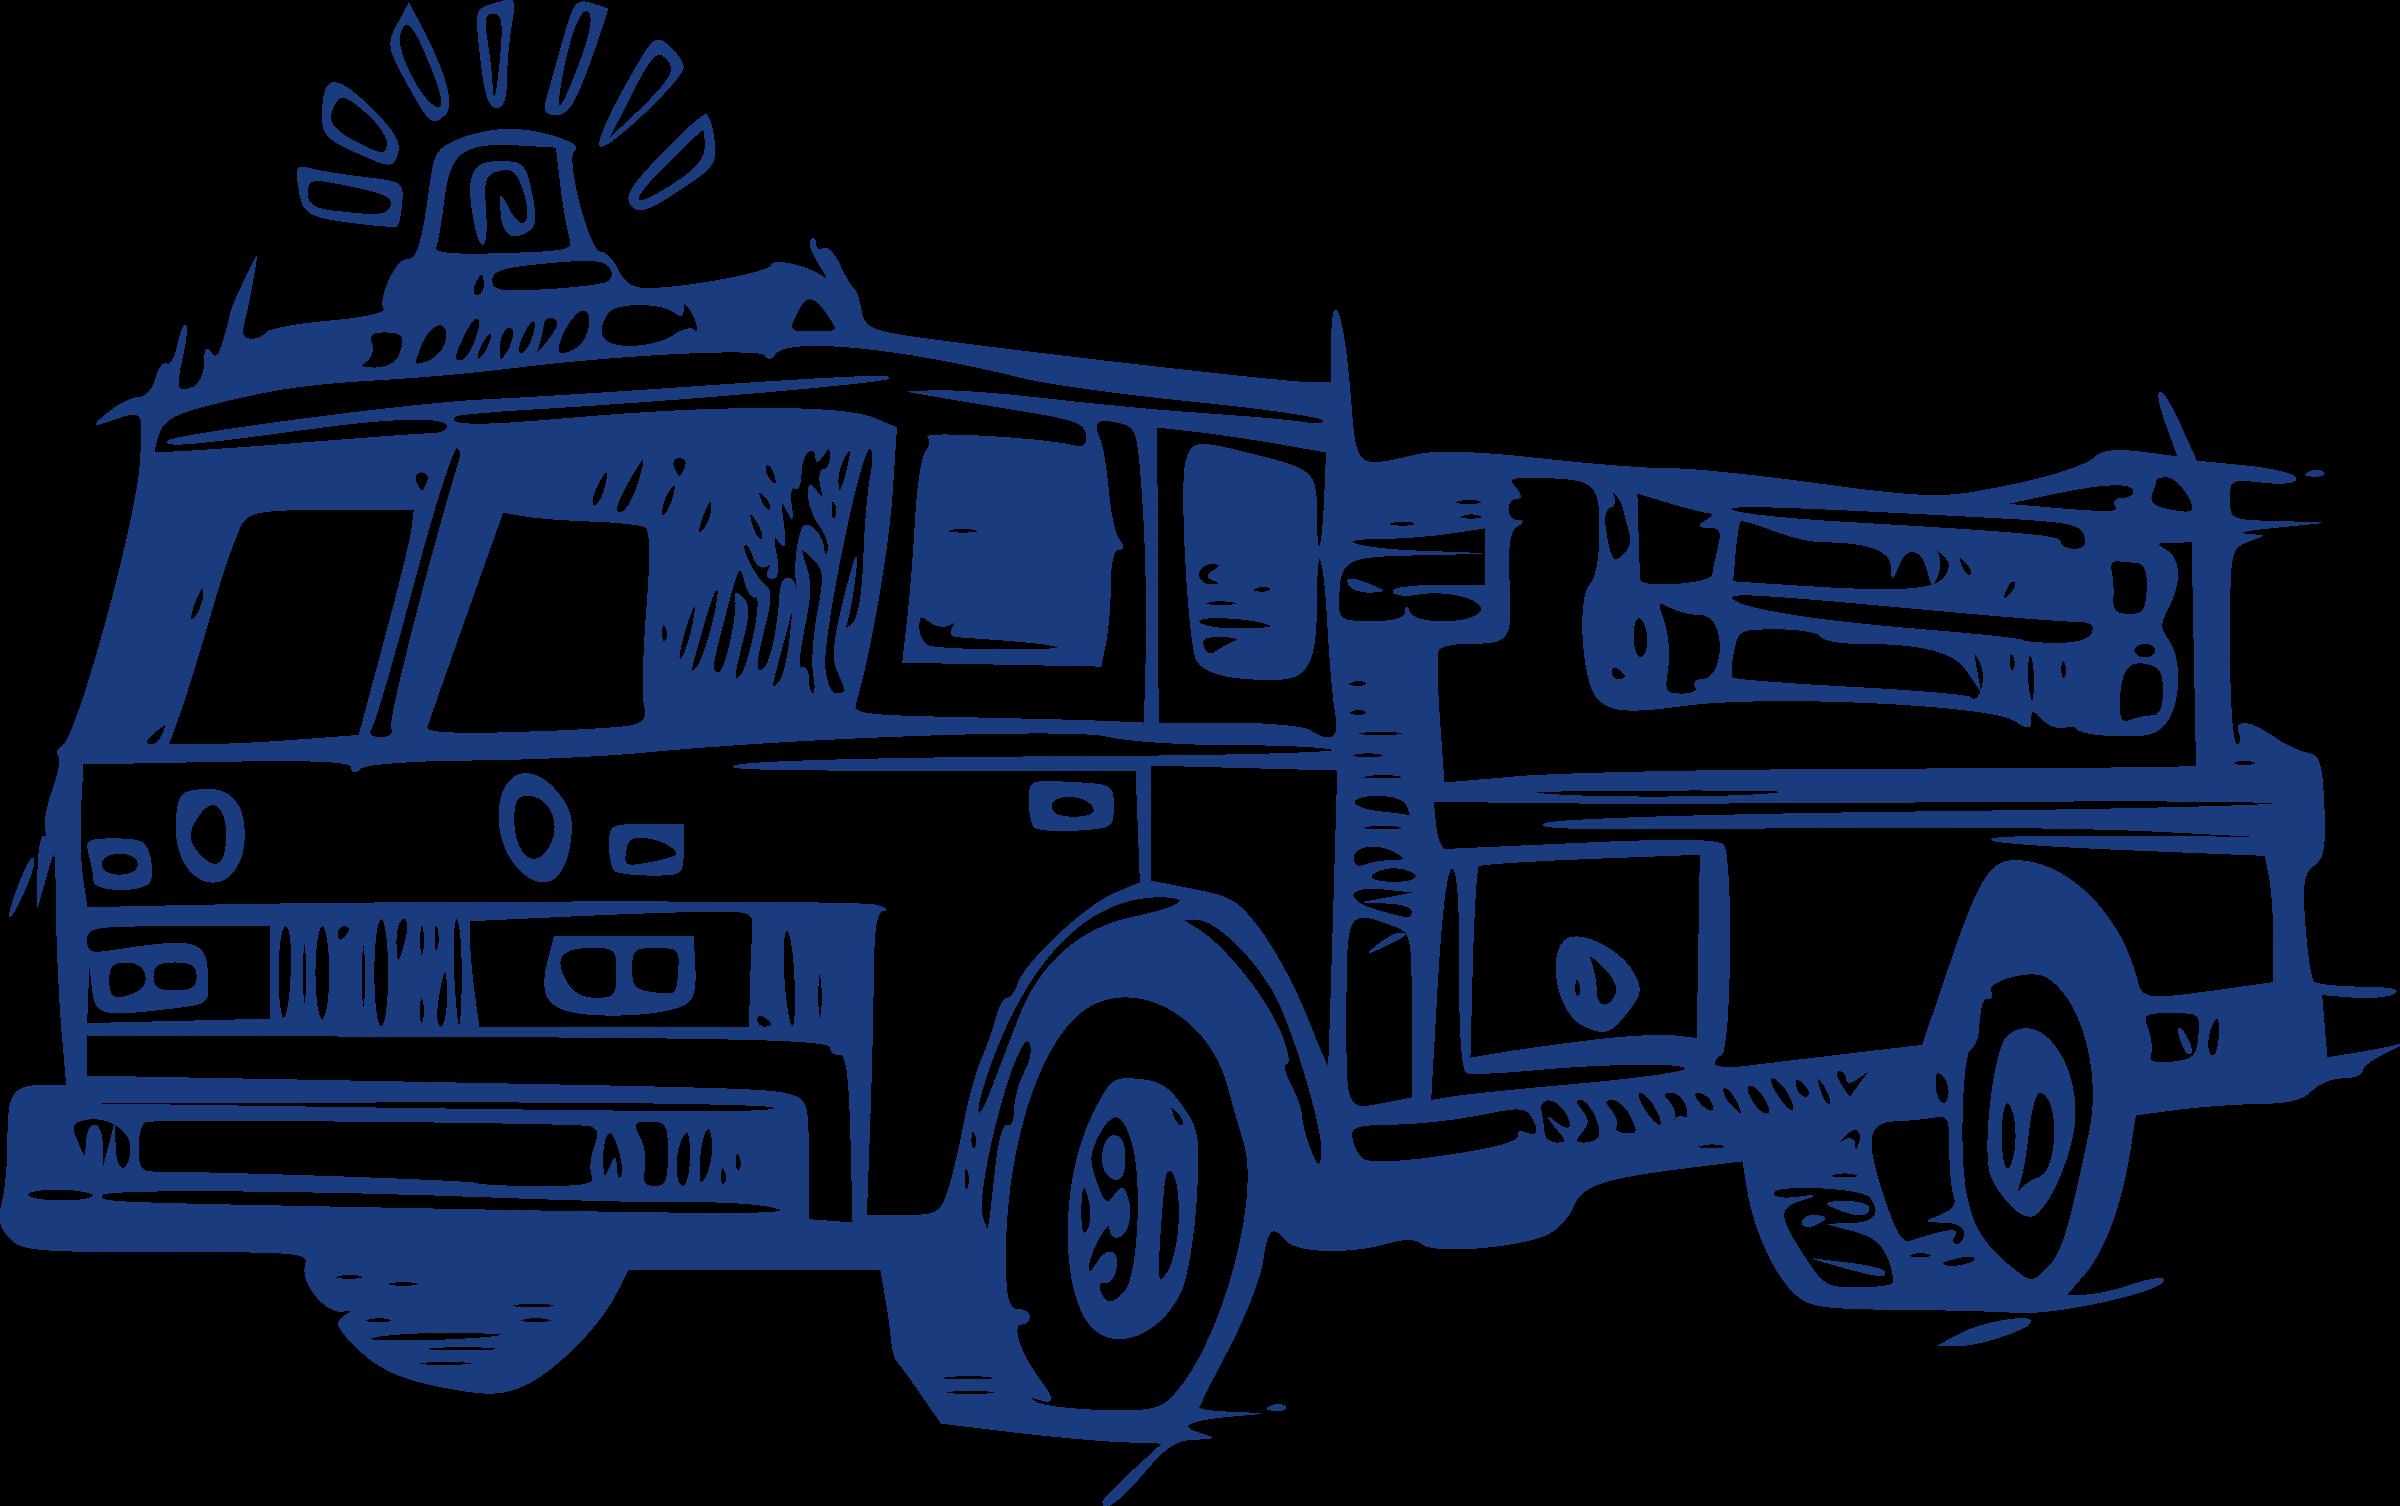 Big image png. Firetruck clipart fire car